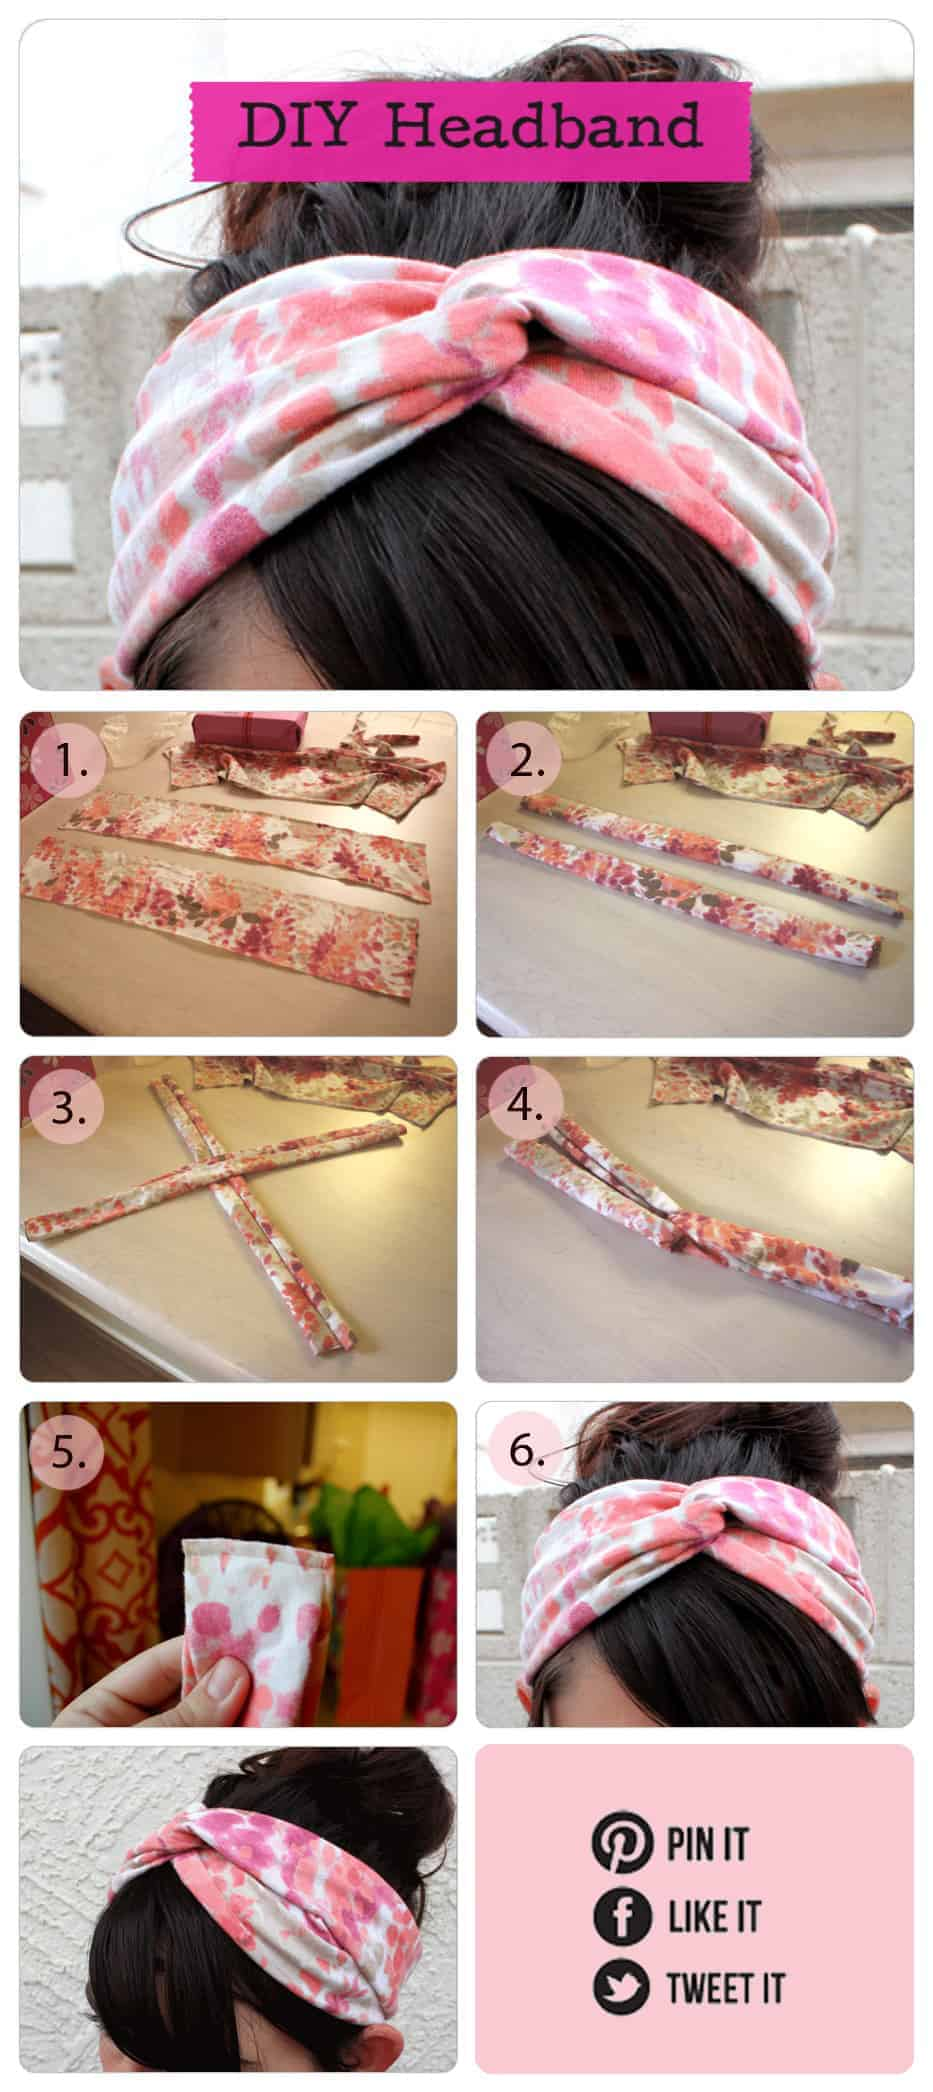 DIY fabric headband tutorial